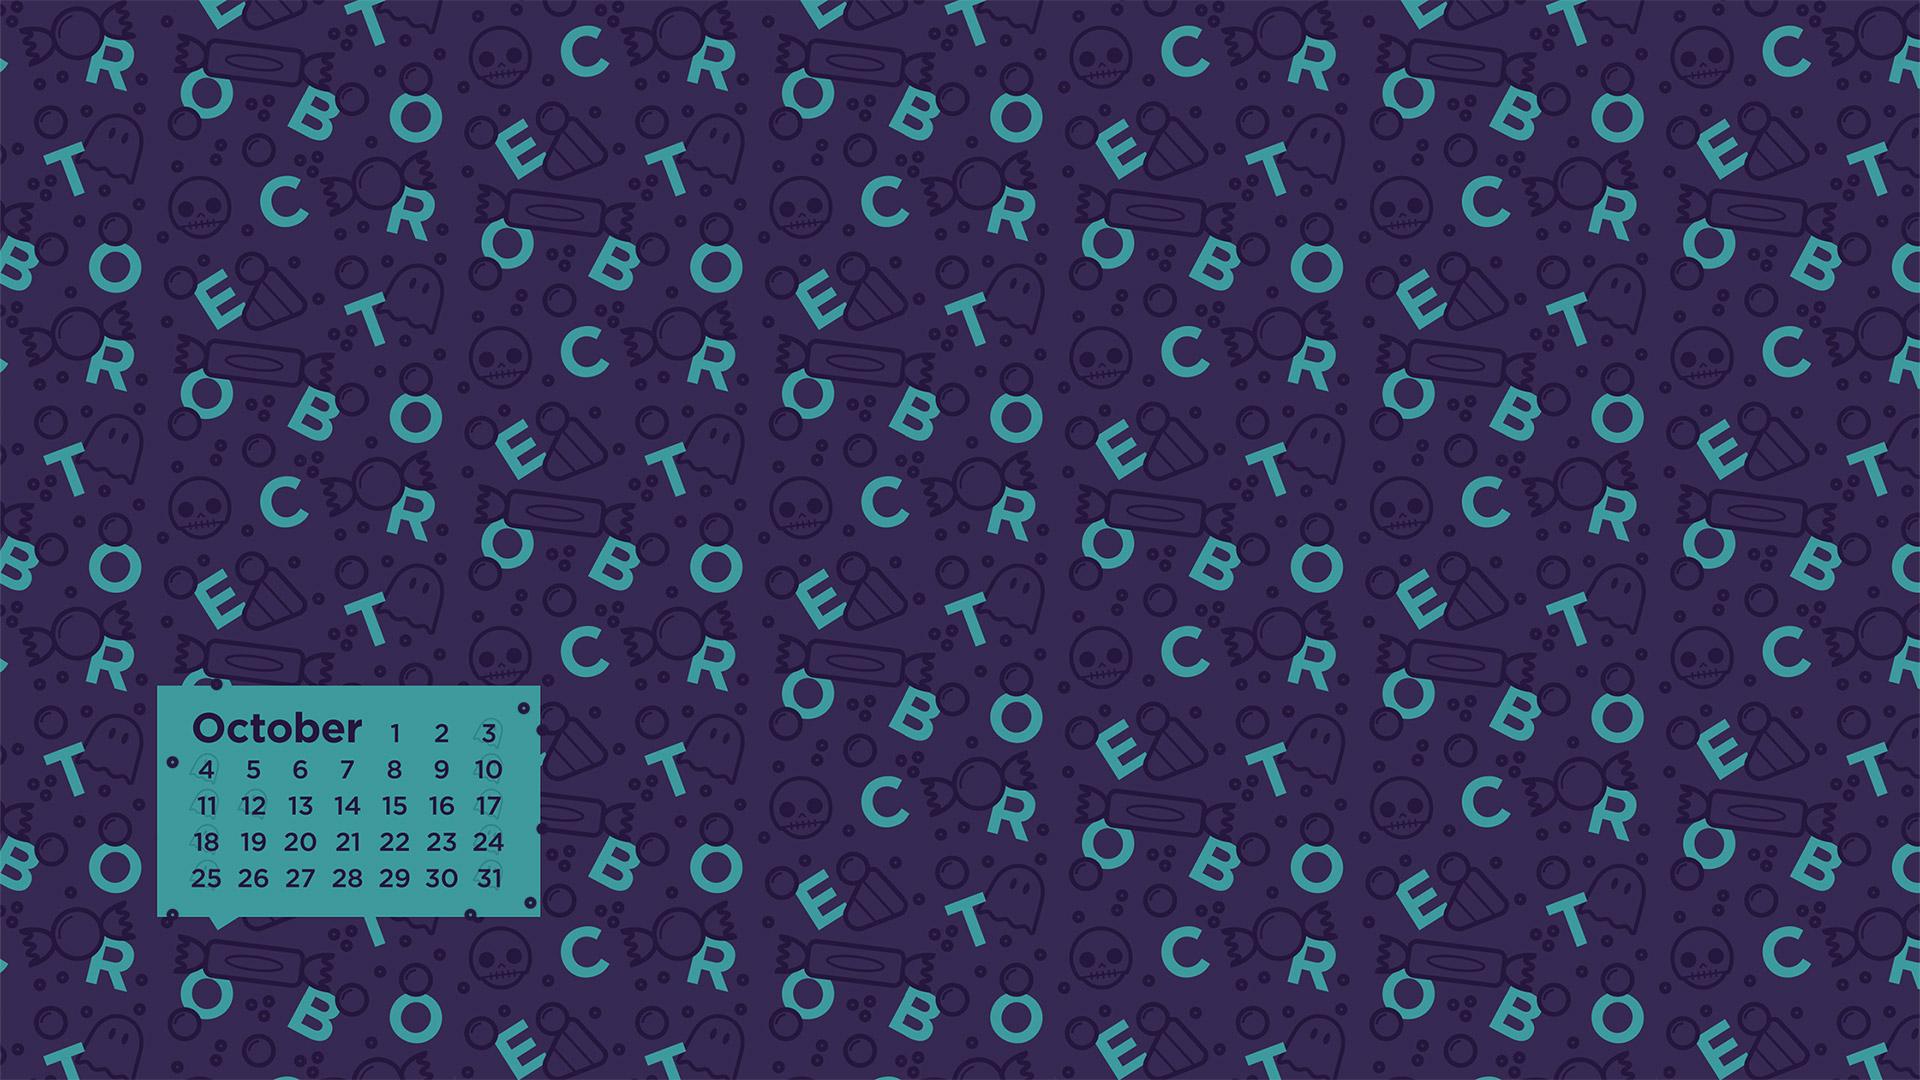 October 2015 Desktop Calendar Wallpaper Paper Leaf 1920x1080